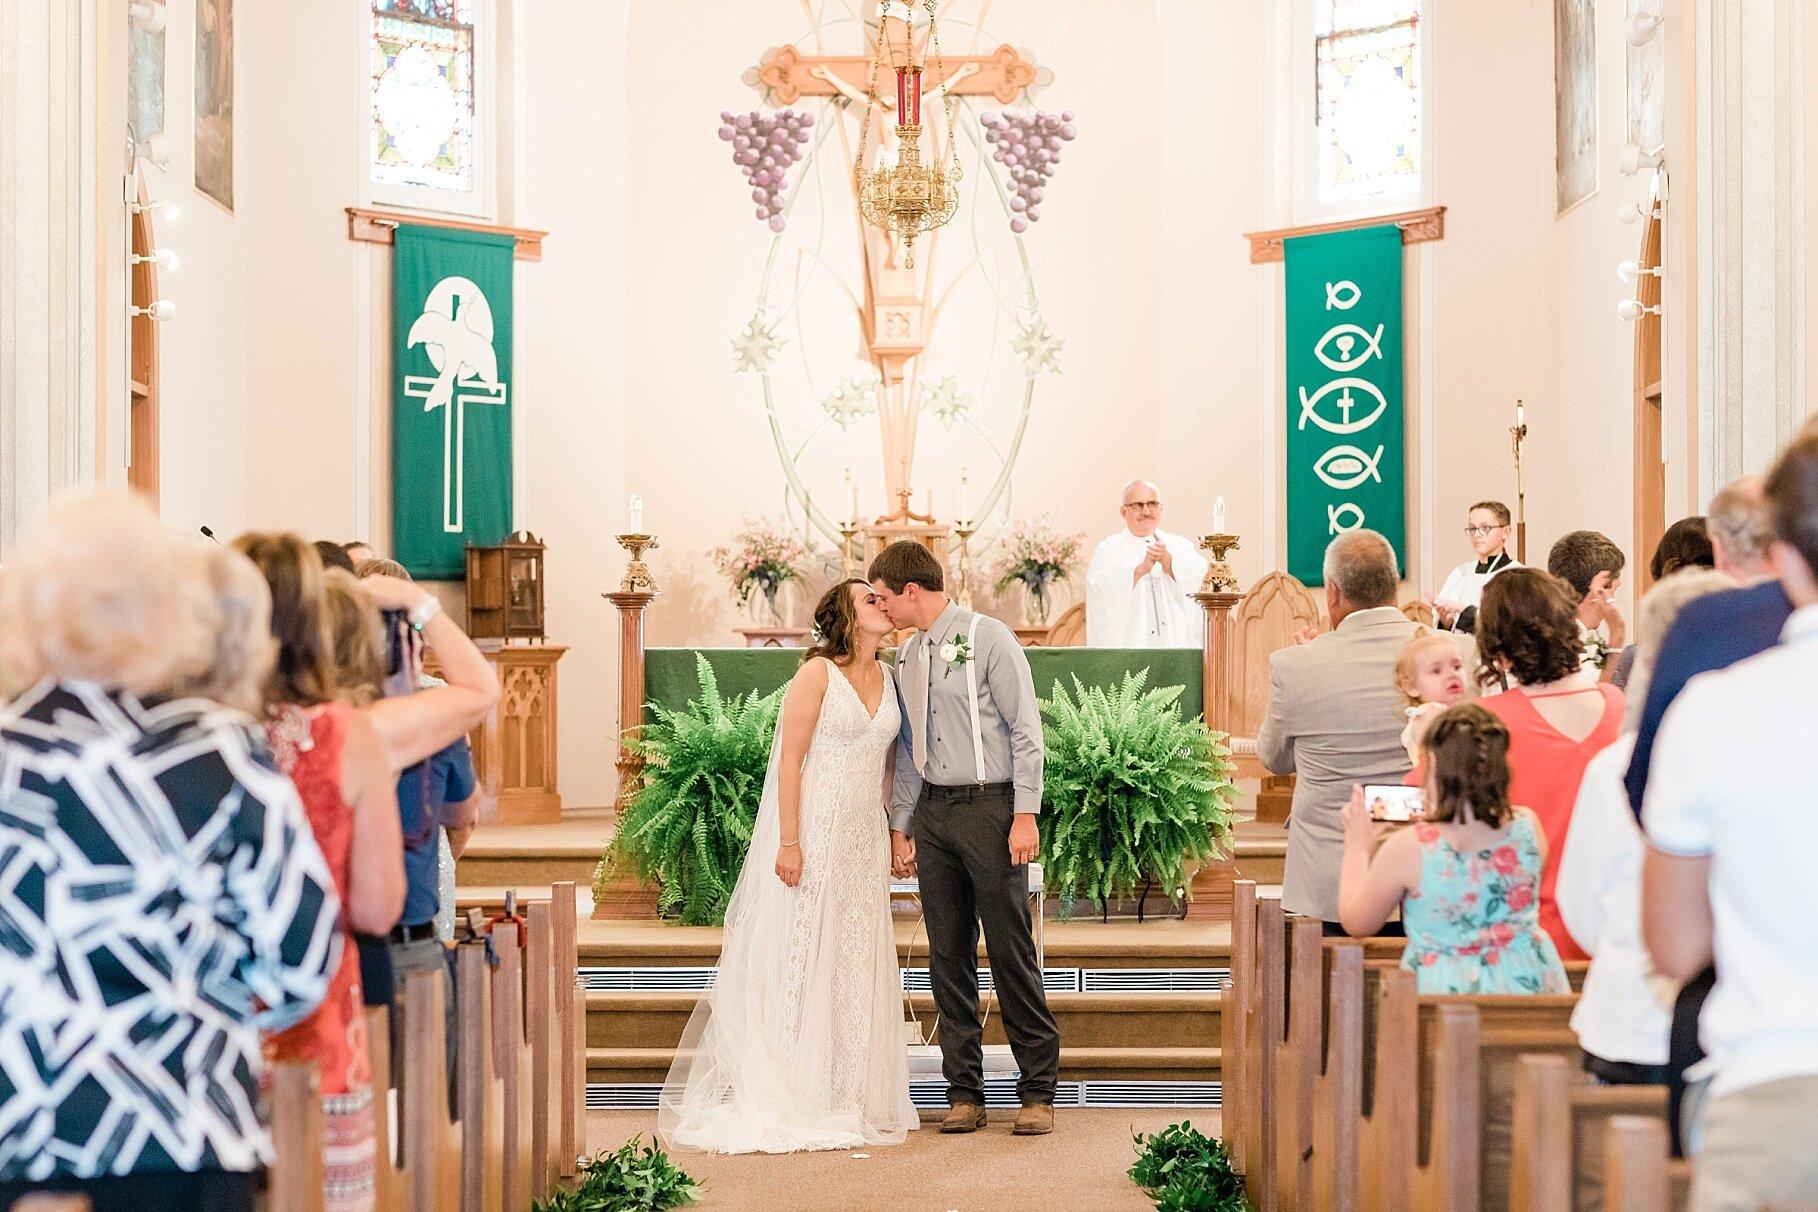 Earth-Toned Wedding by KKP Associate Wedding Photographer and Kelsi Kliethermes Photography Best Columbia Missouri Wedding Photographer_0001.jpg